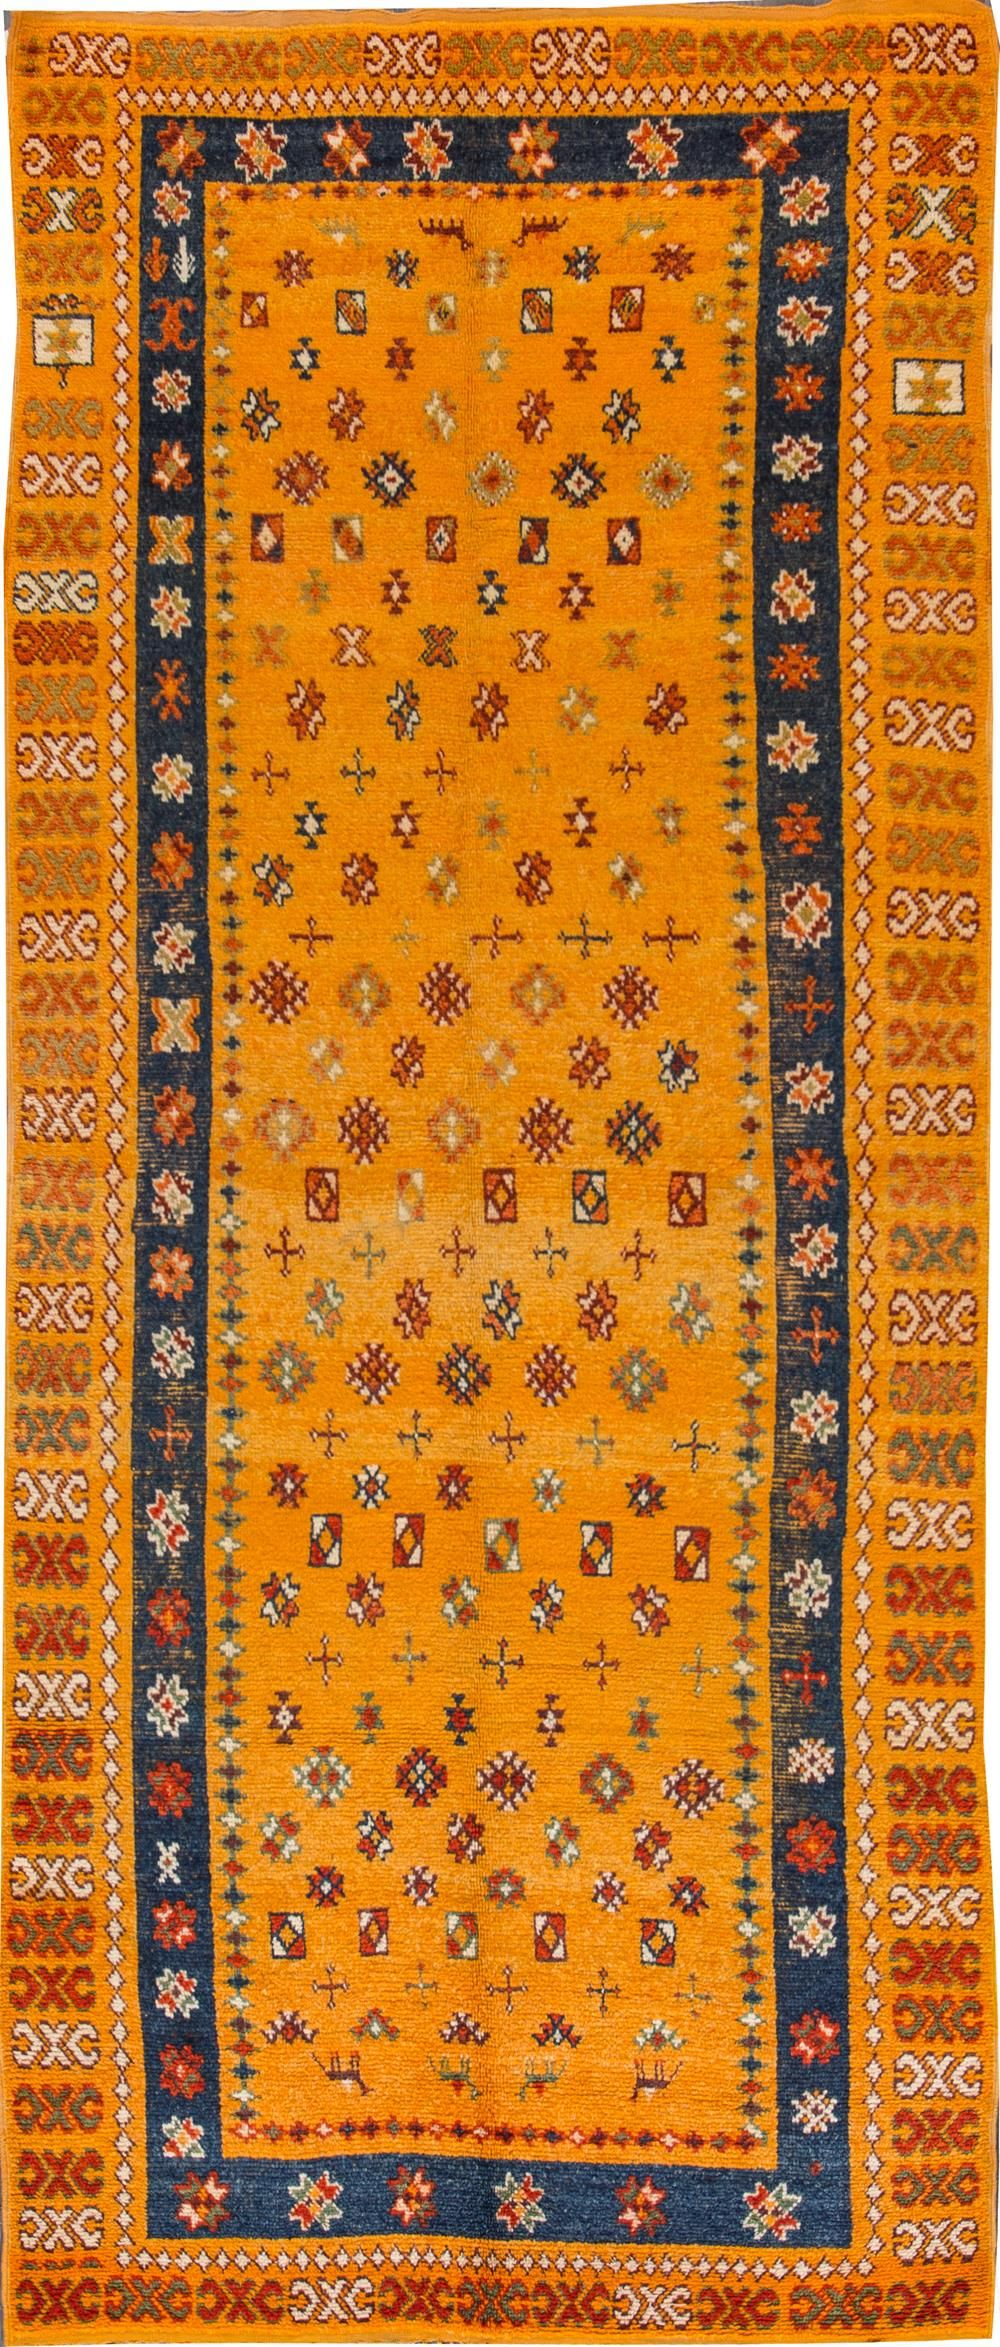 Moroccan Rug, 5' x 13' | Living room drapes, November ...